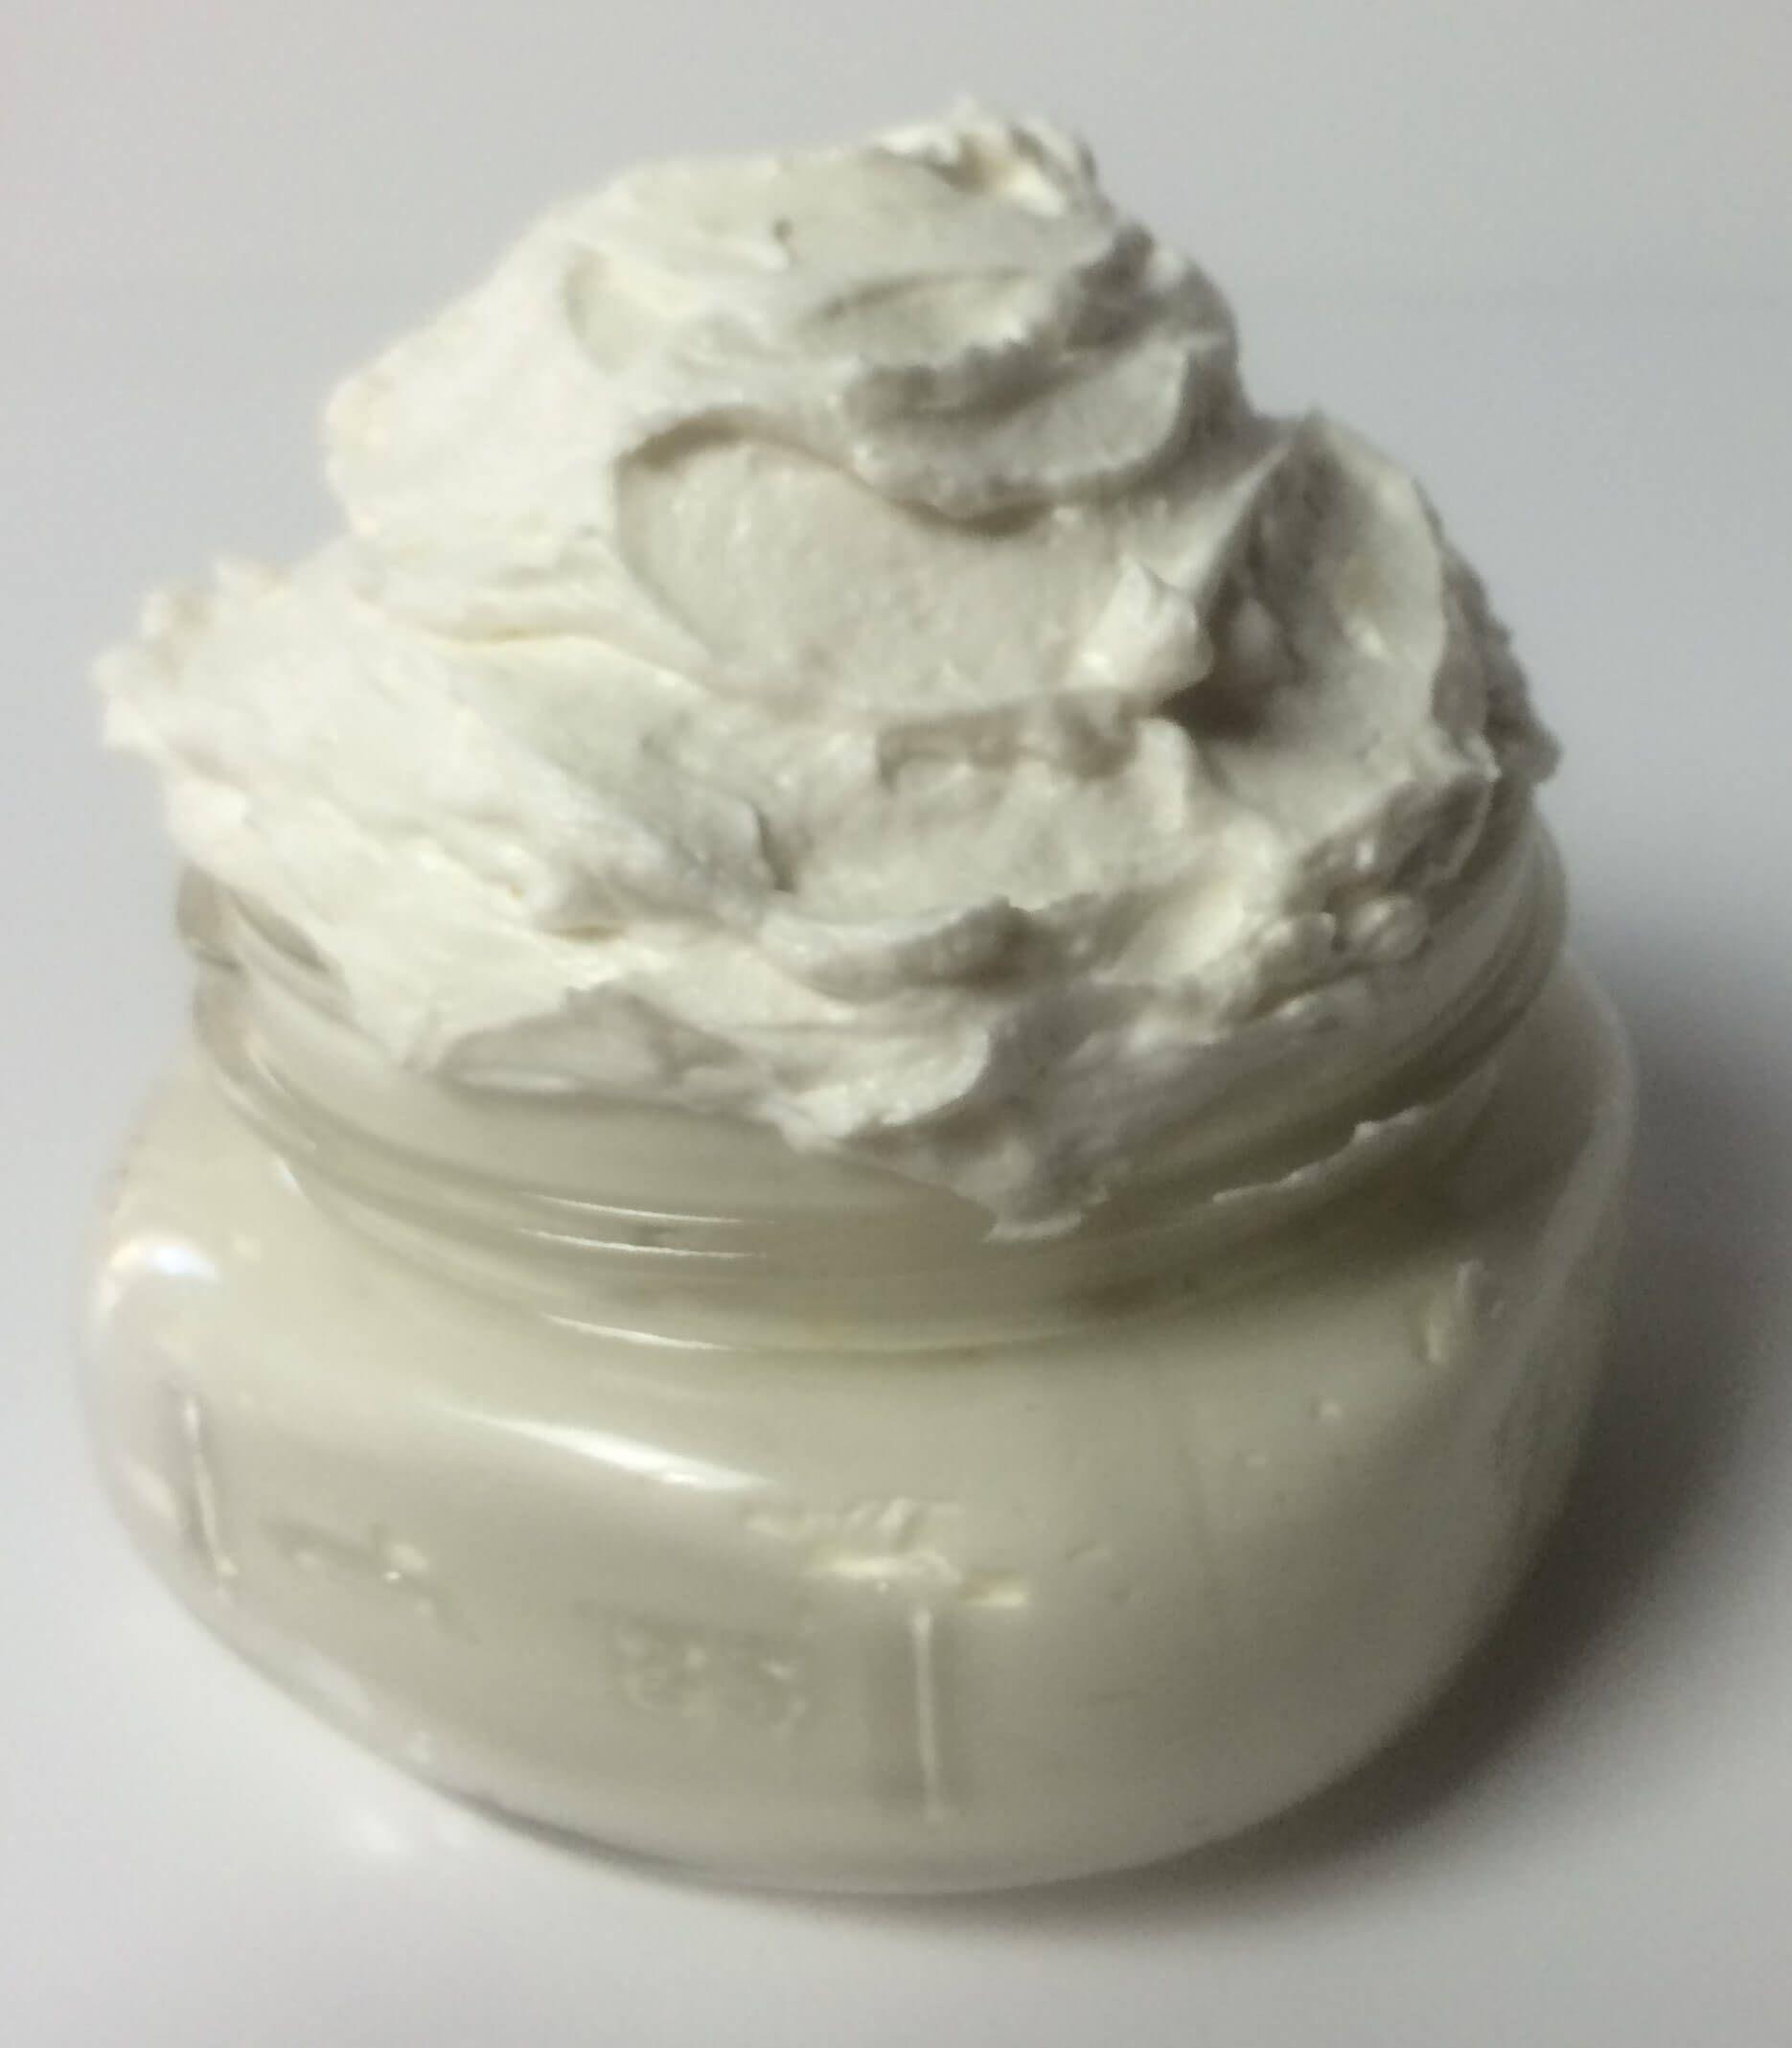 Soft & Silky Whipped Body Butter Recipe Homemade body